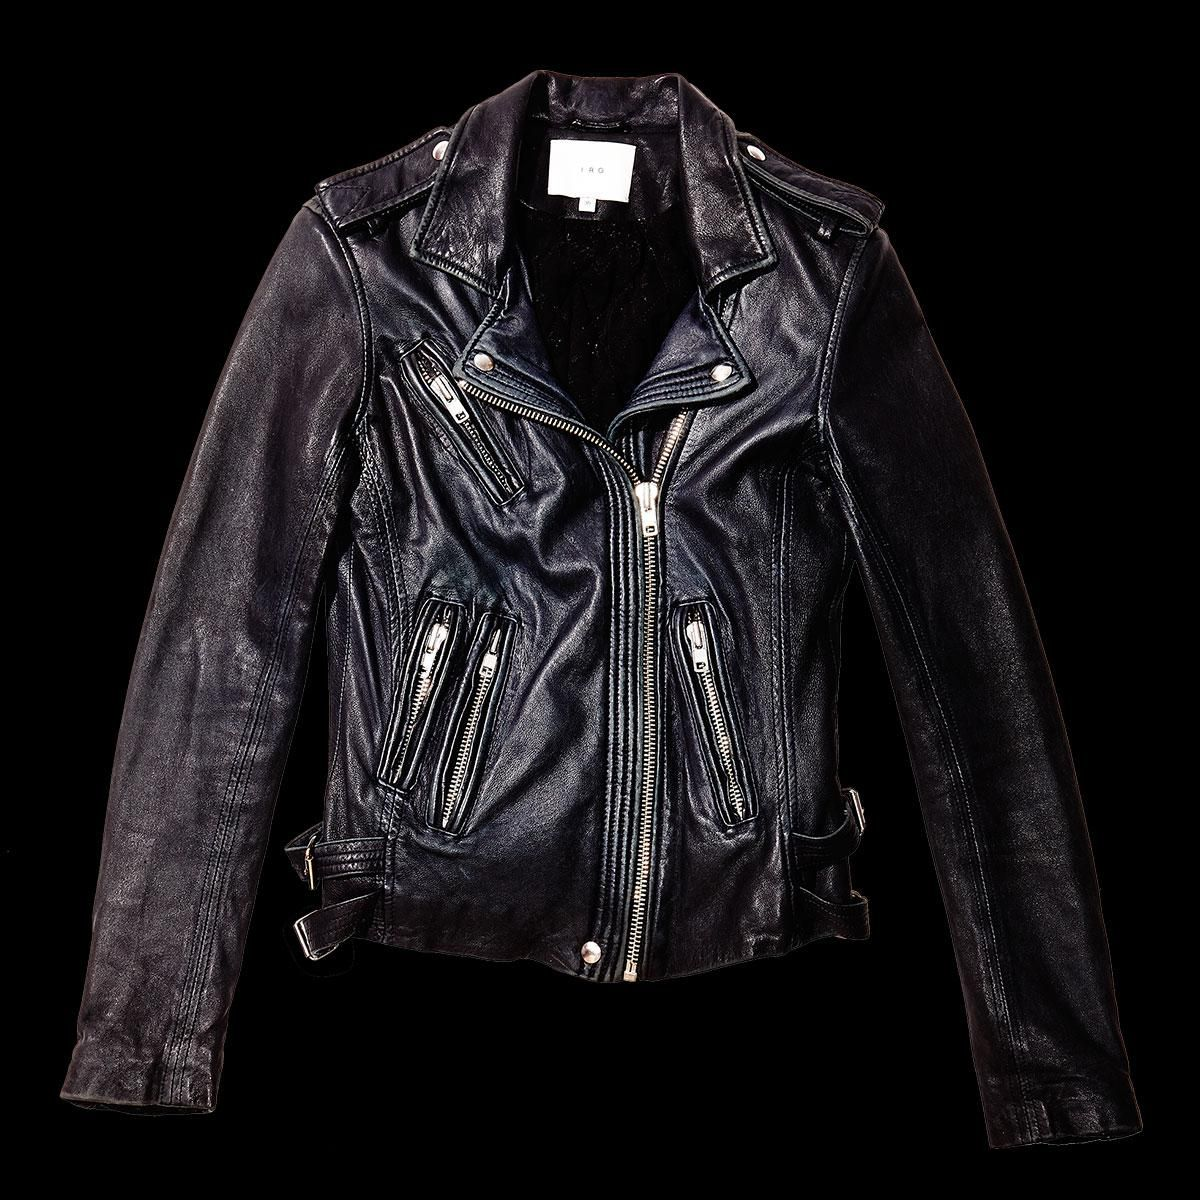 Revved Up 19 Biker Jackets for Fall Jackets, Mens biker